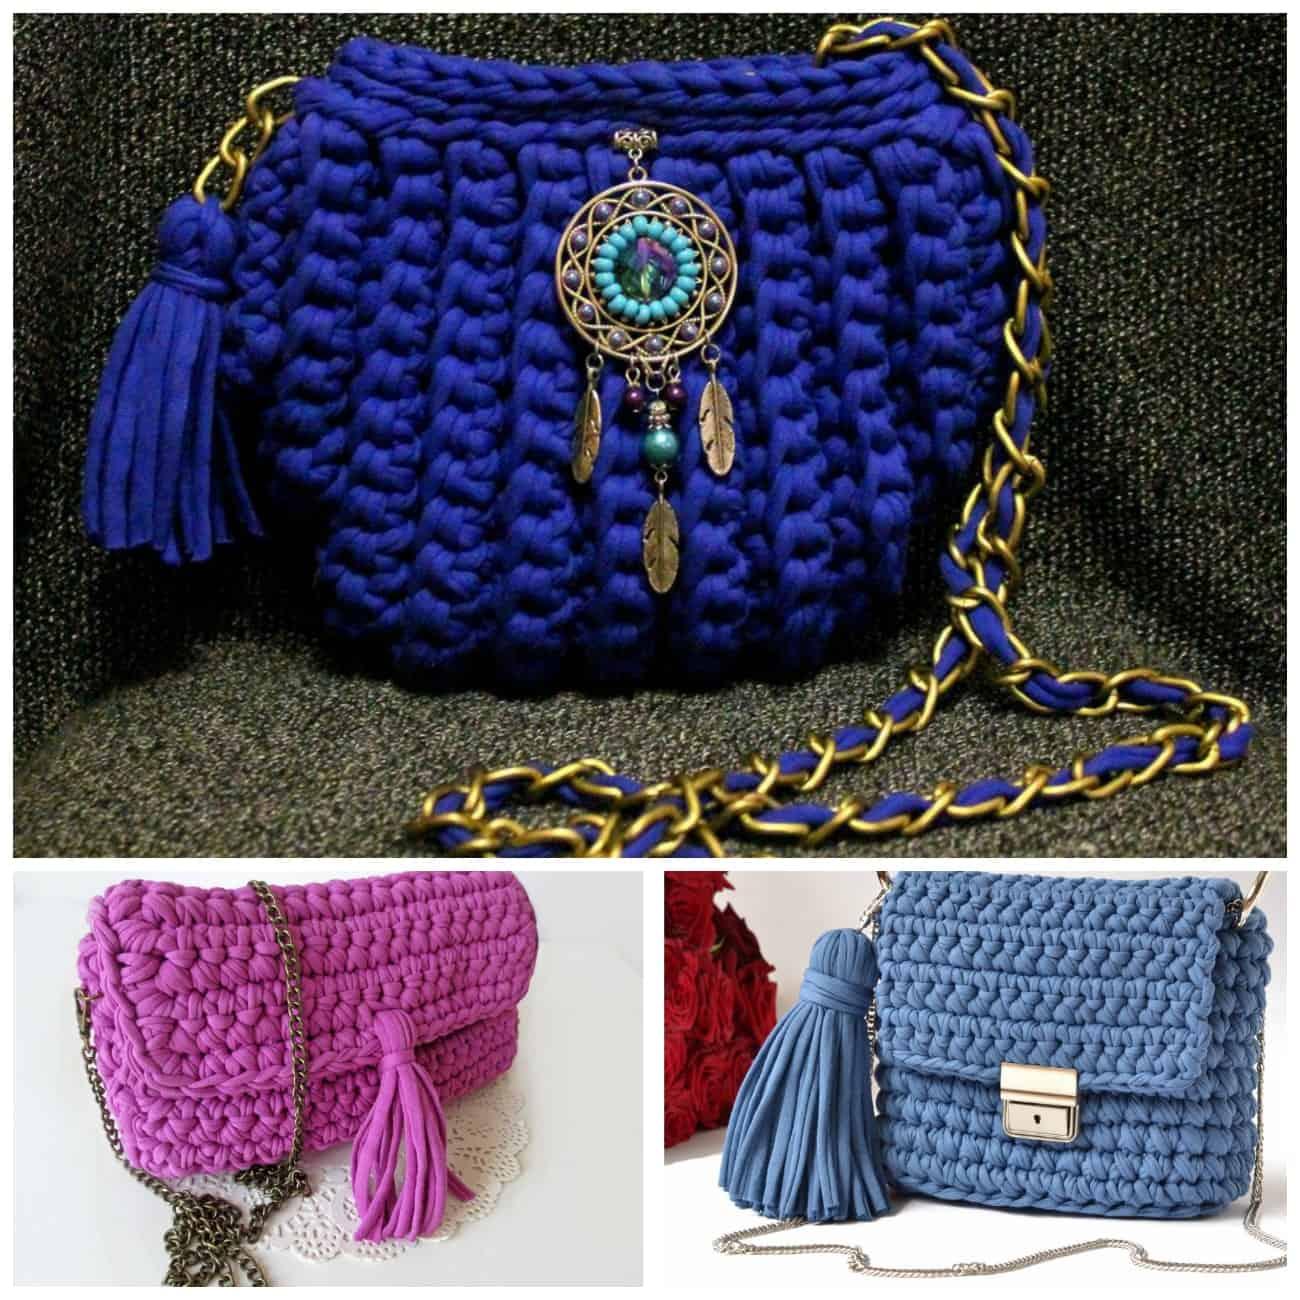 вязаные сумки тенденции в моде